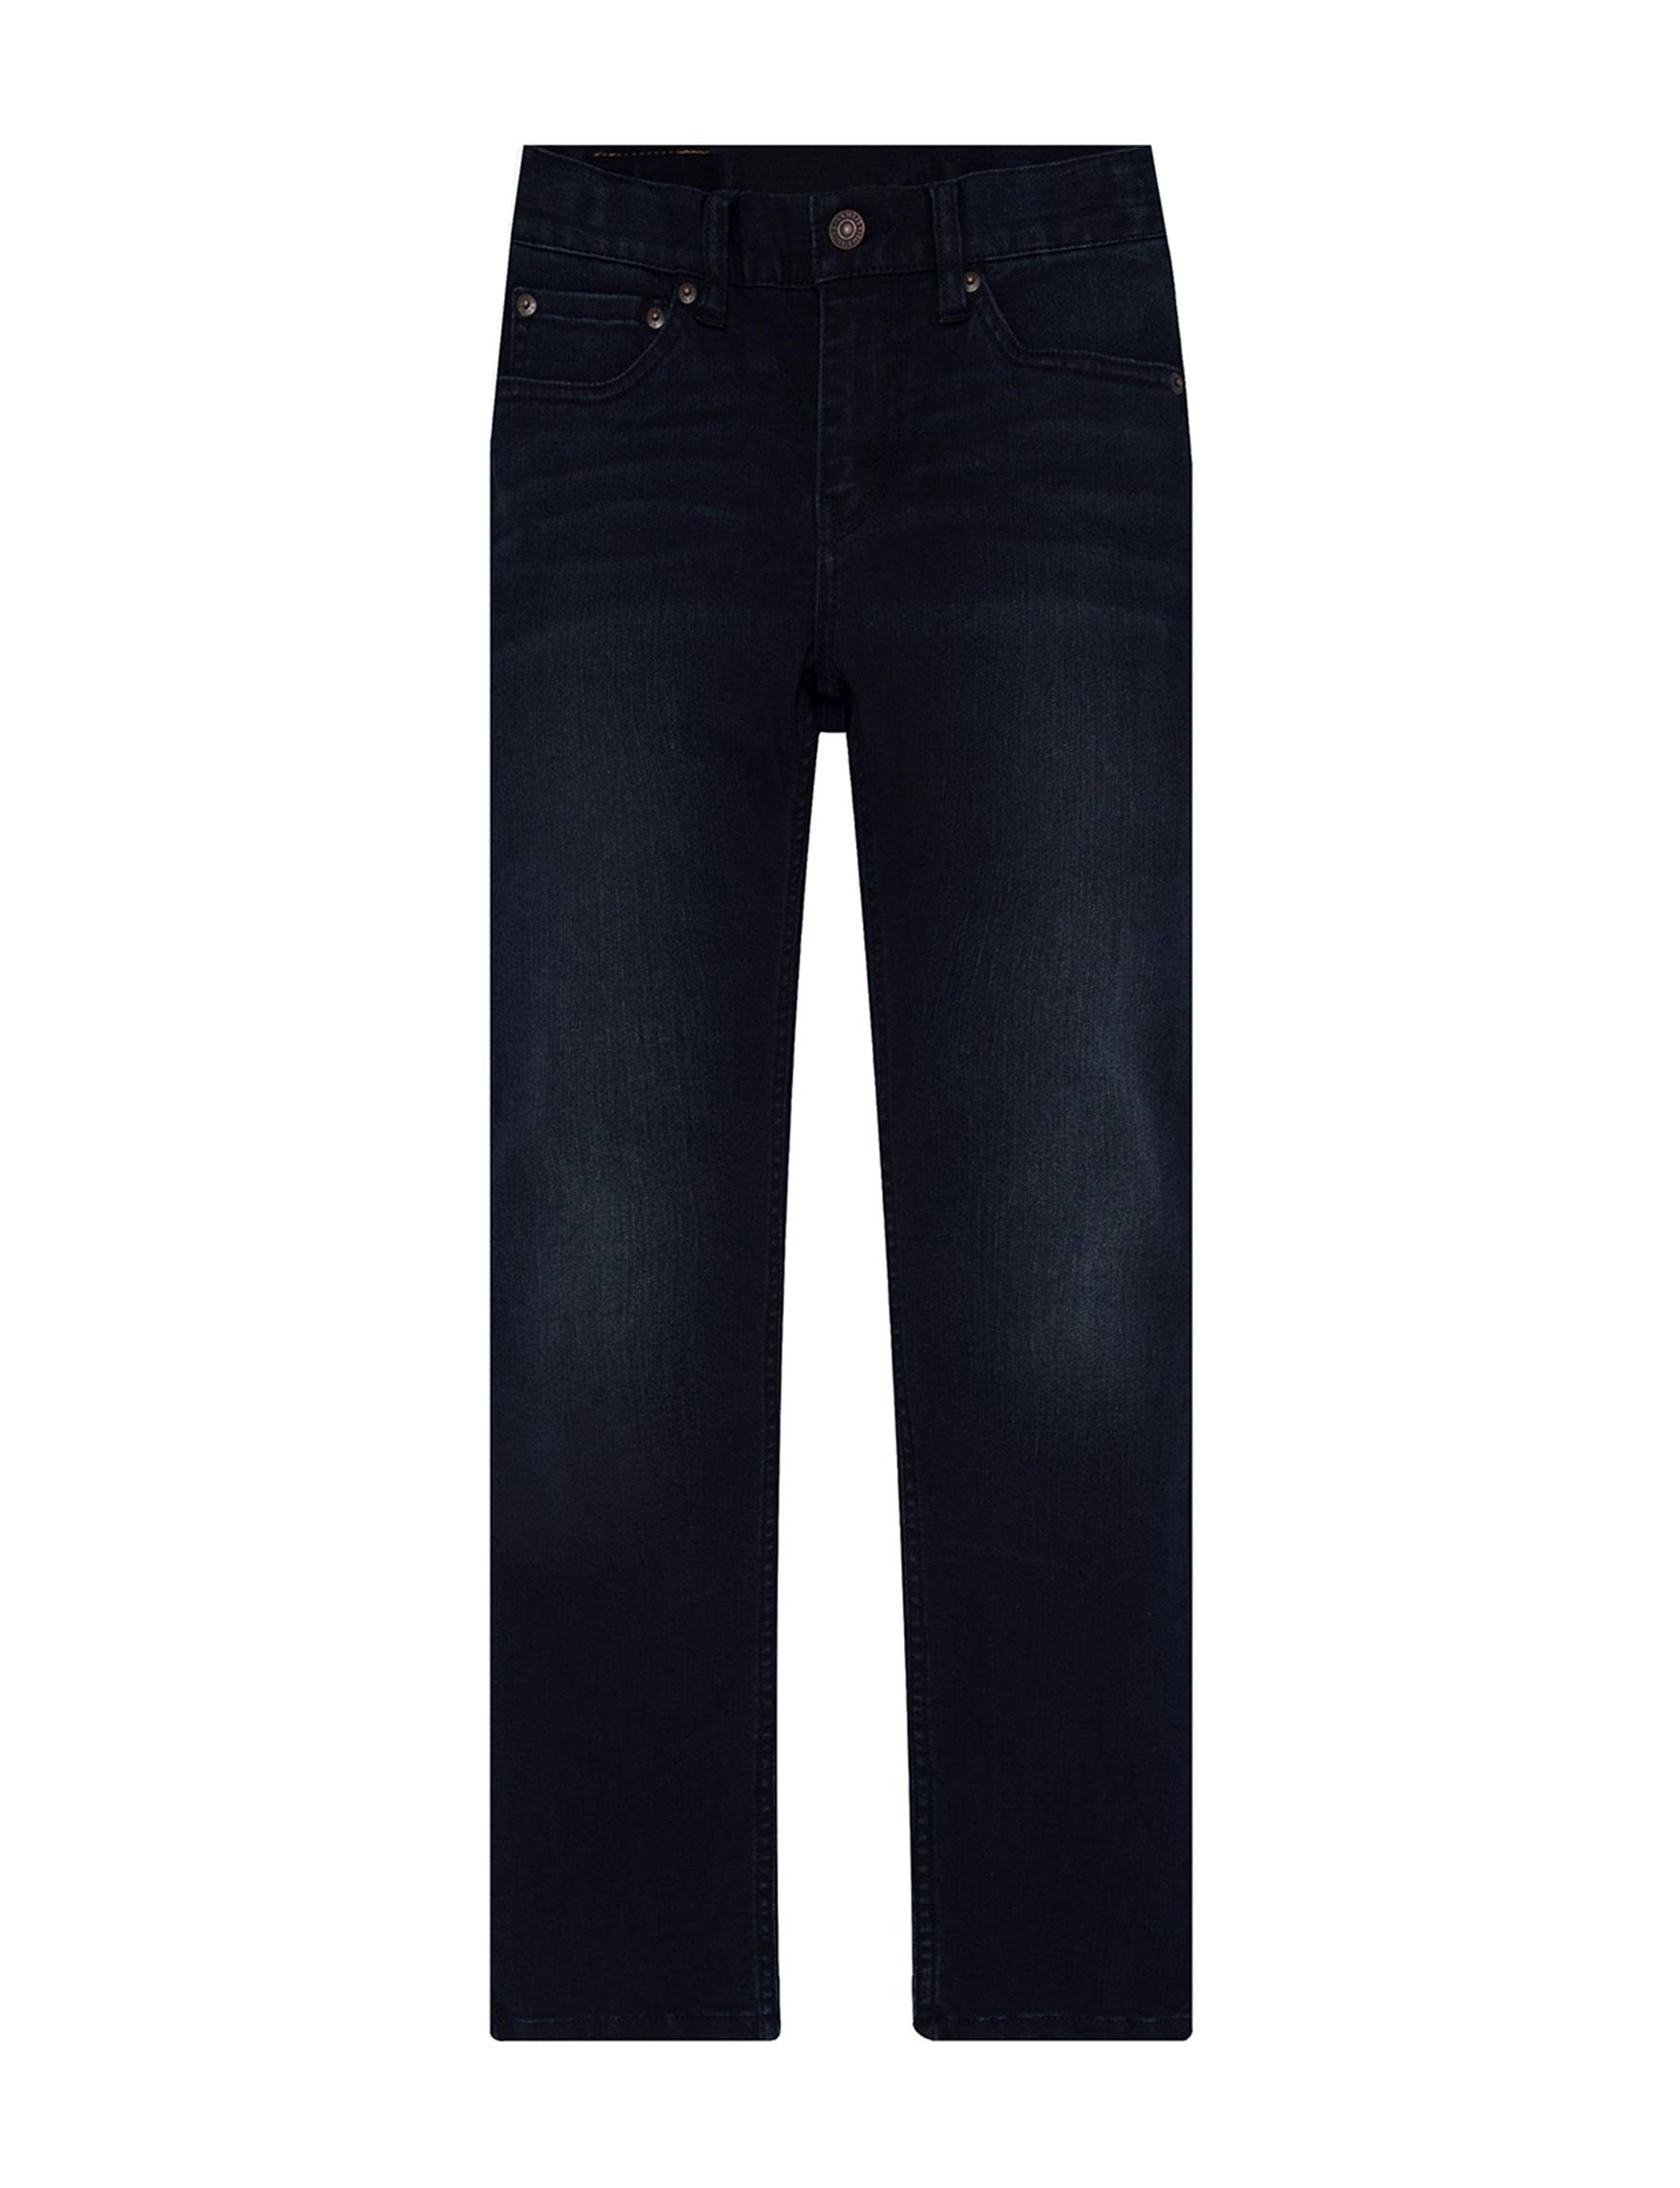 511 4 Levi's Von Slim Dunkelblau Jeans Boys xq6ZAw7x